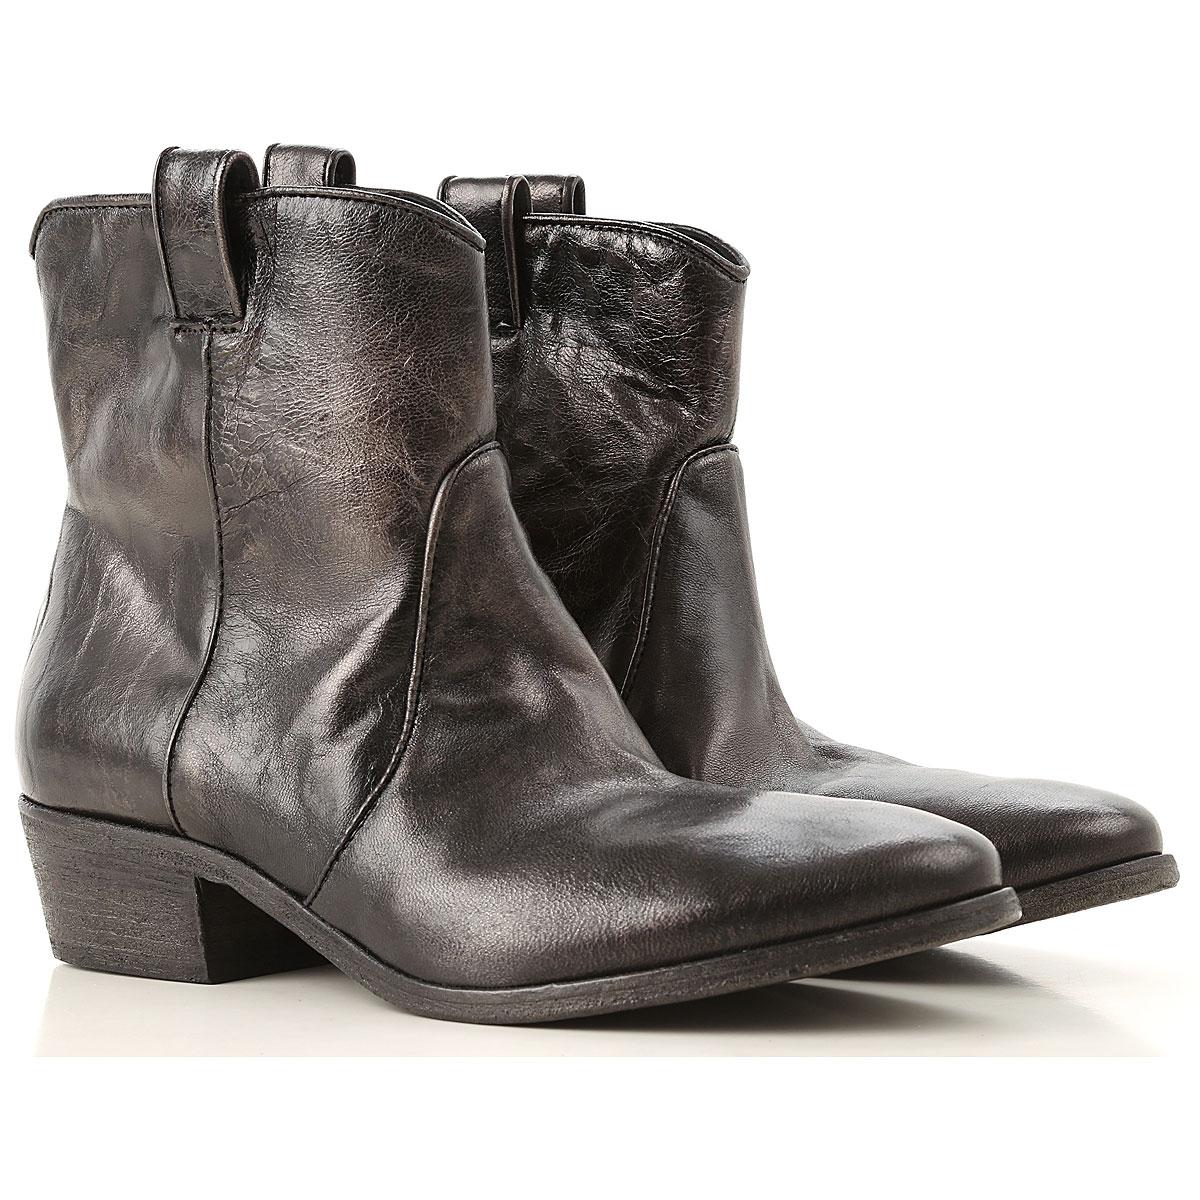 Image of Elena Iachi Boots for Women, Booties, Dark Gunmetal, Leather, 2017, 10 6 7 8 9